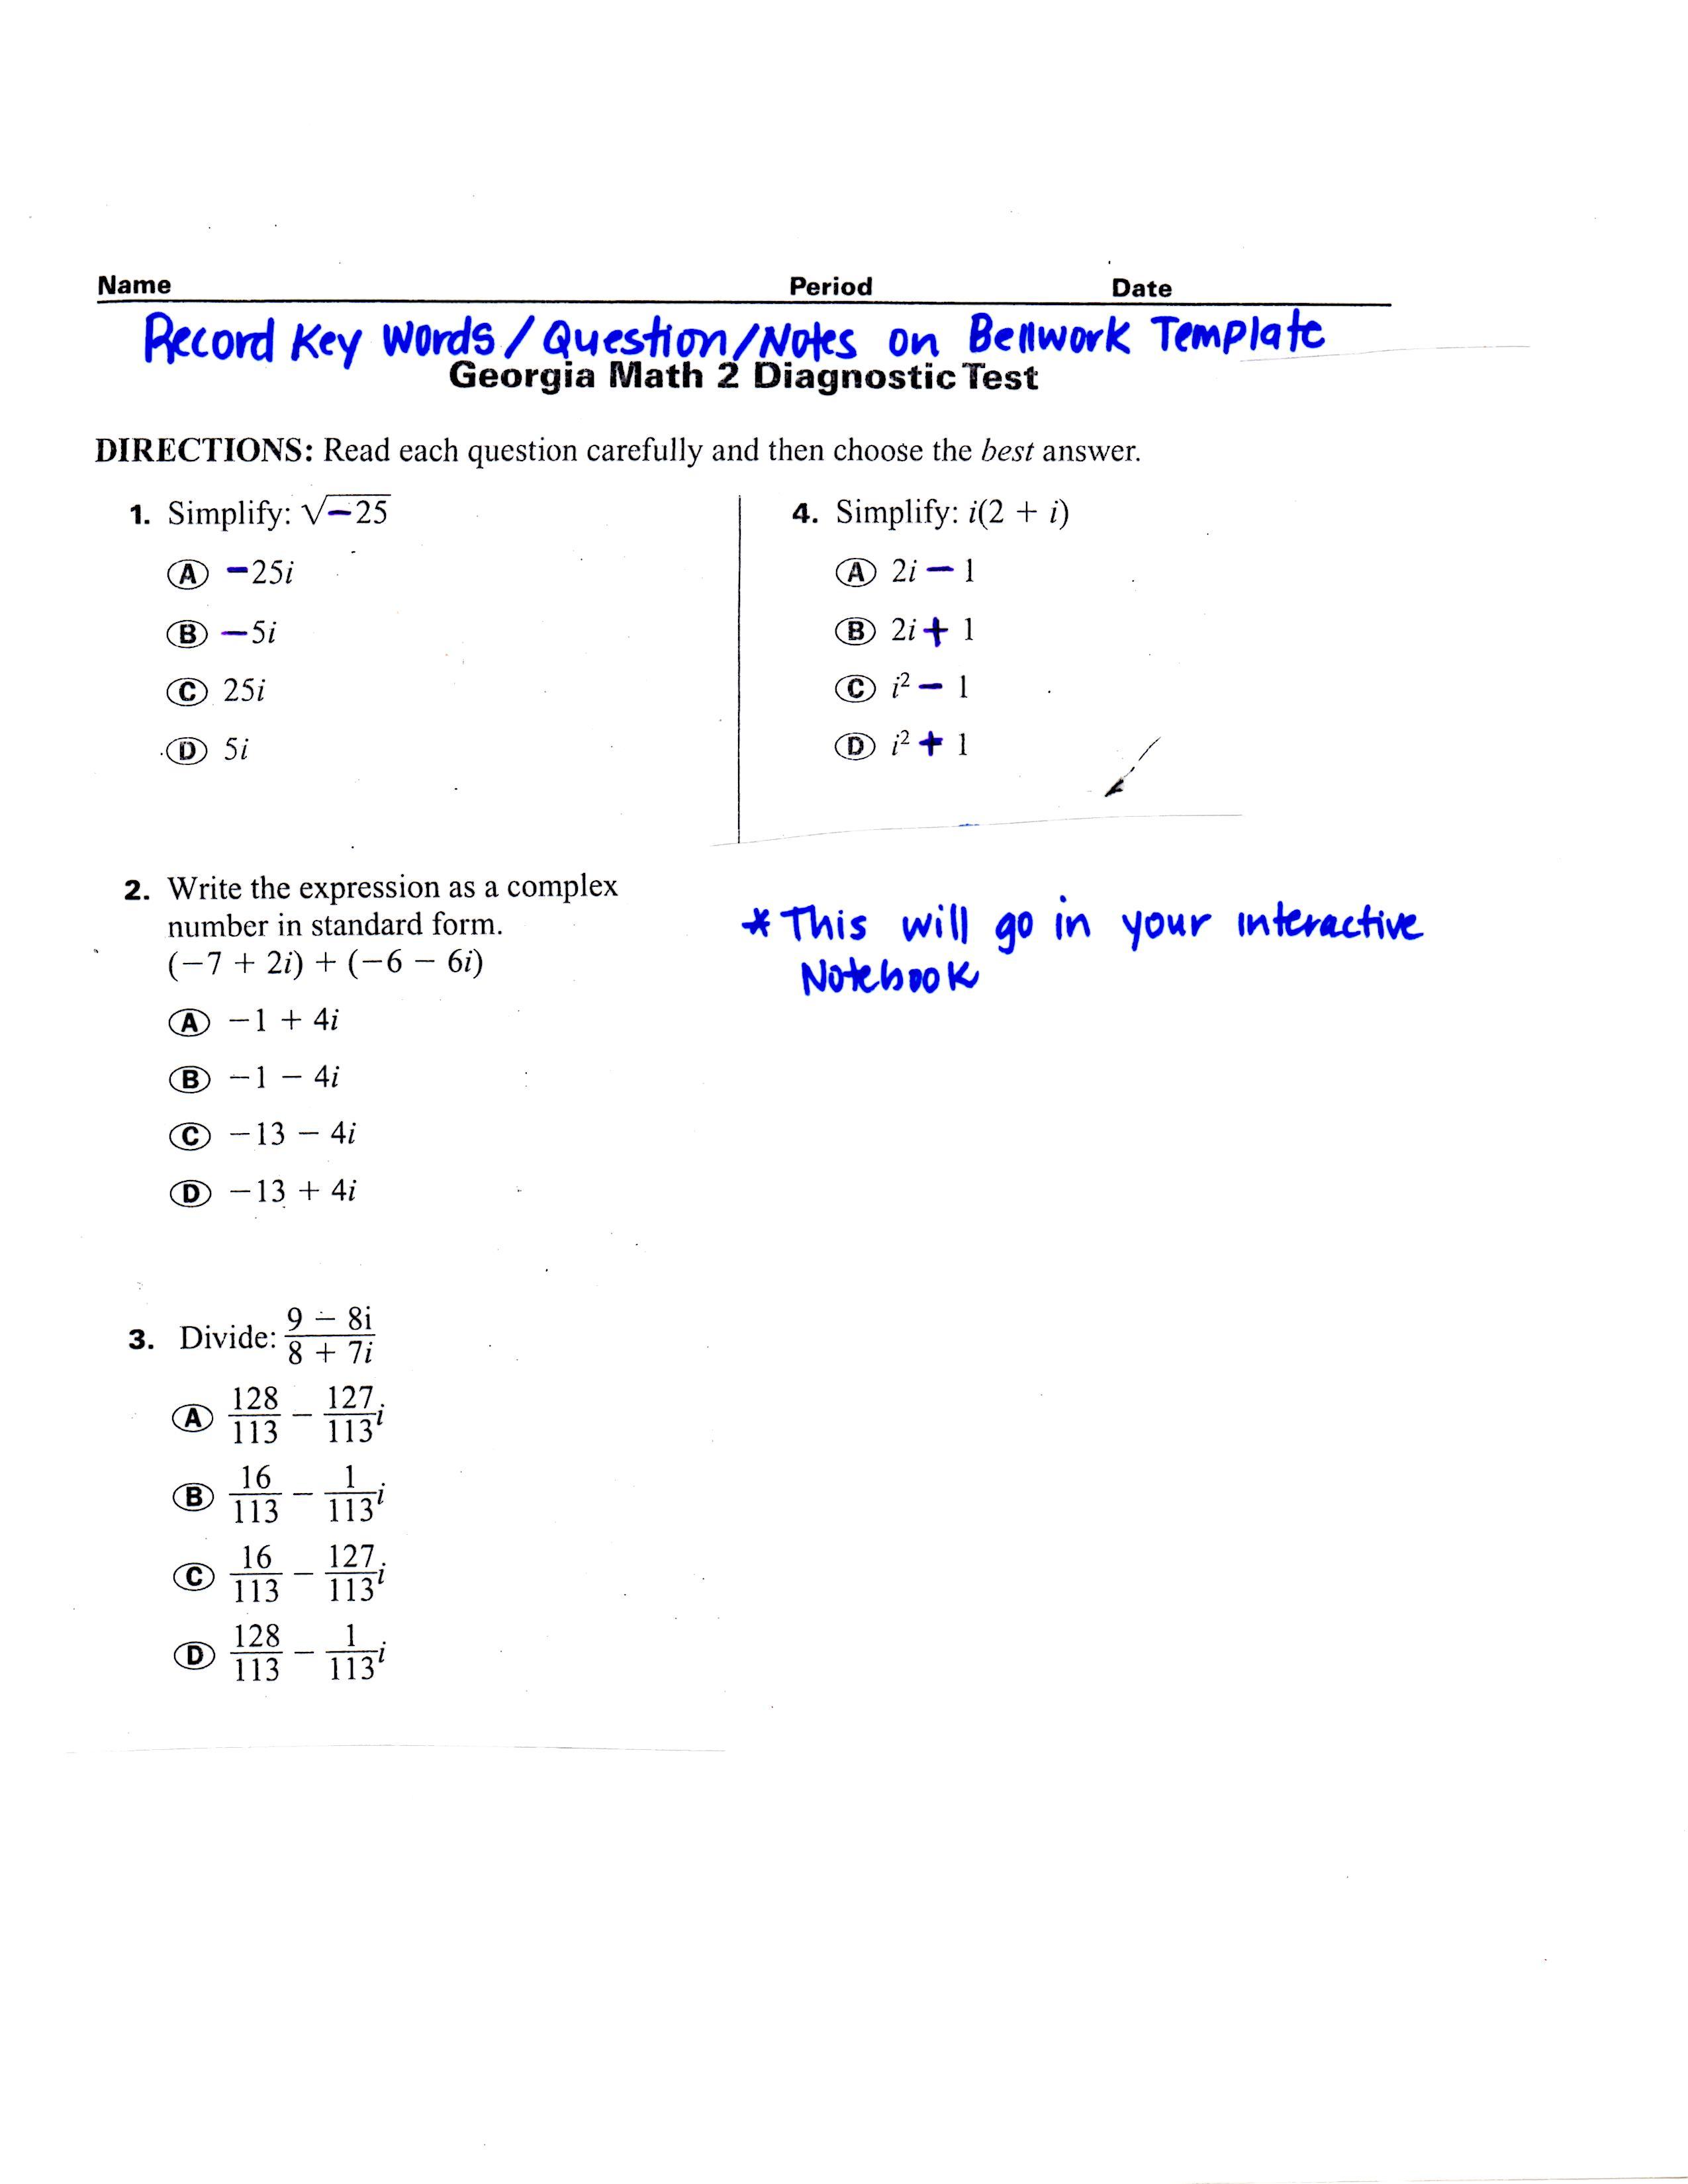 Chandra harriss blog math 2 support bellwork standardize test prep complex numbers falaconquin